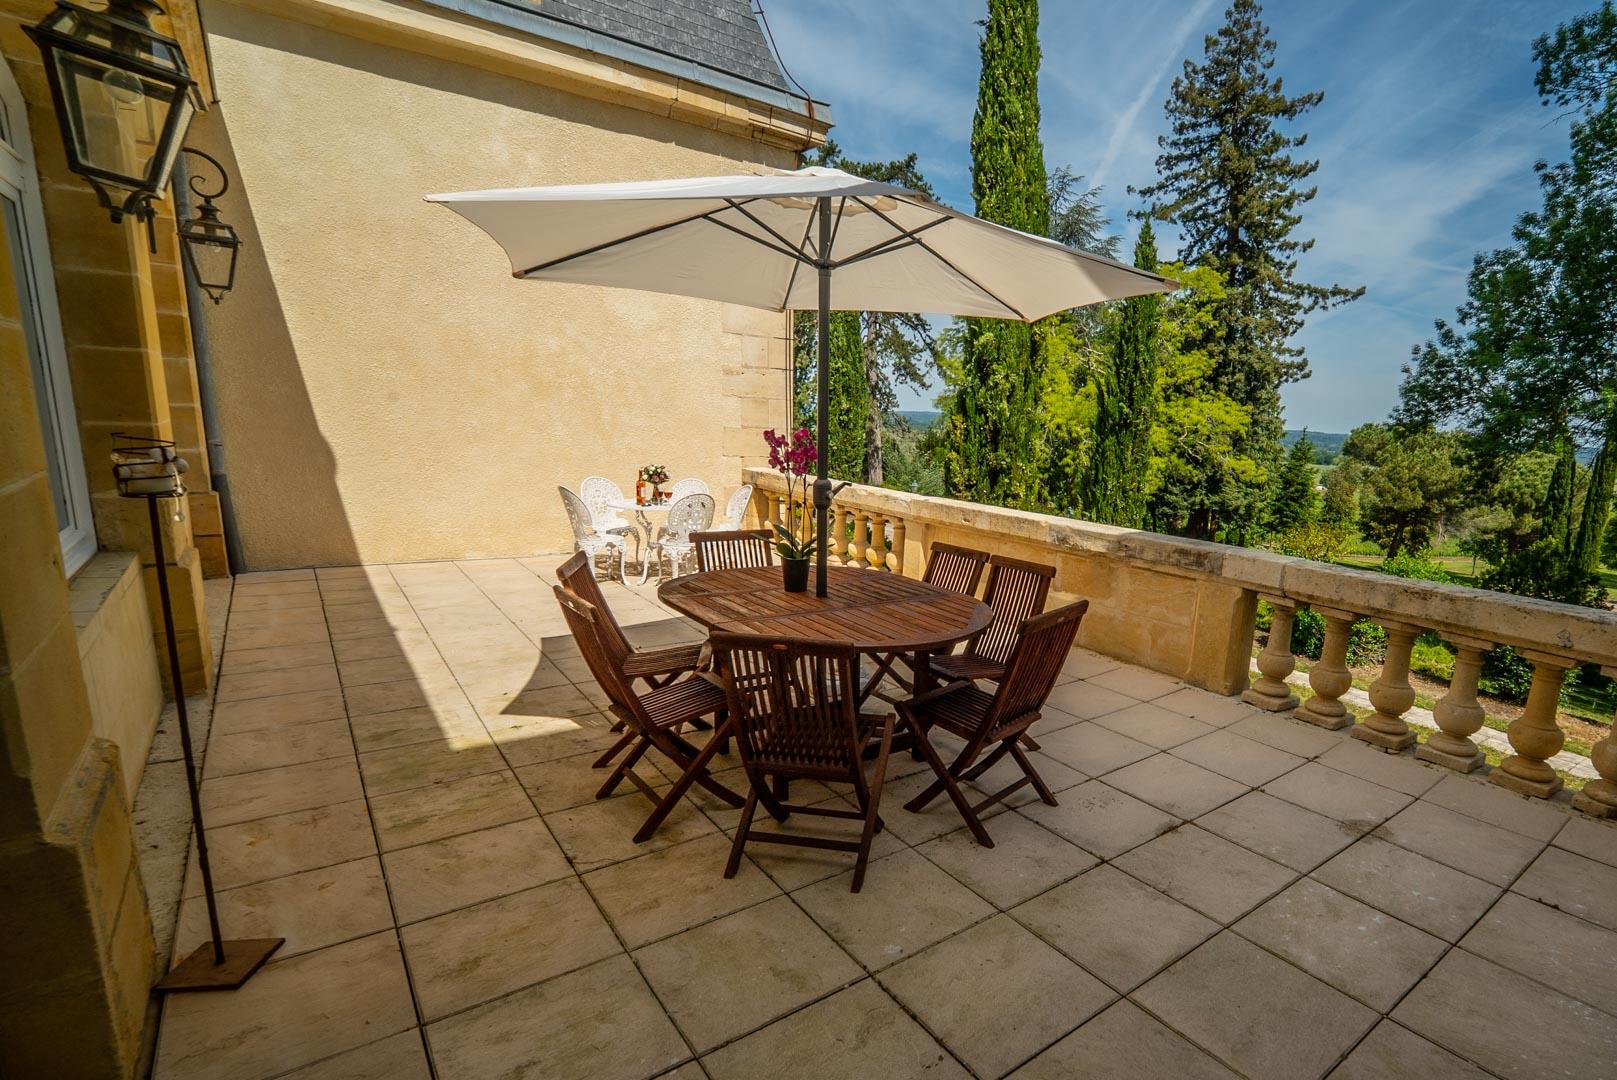 Exterieur Chateau Rauly location bergerac Monbazillac